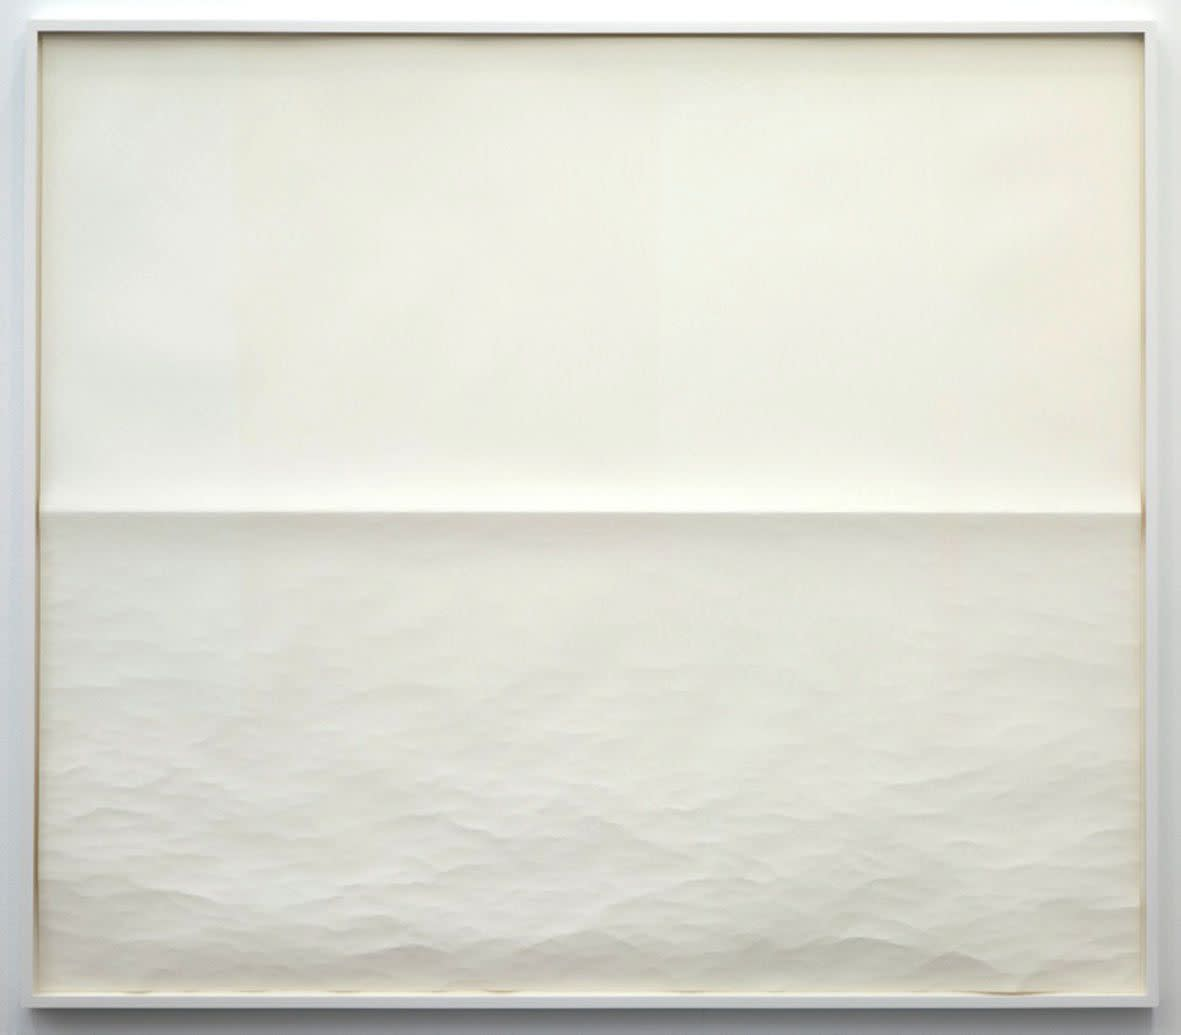 "<span class=""link fancybox-details-link""><a href=""/exhibitions/133/works/artworks9417/"">View Detail Page</a></span><div class=""artist""><strong>Tom Friedman</strong></div><div class=""title""><em>Untitled (Seascape 2)</em>, 2012</div><div class=""medium"">paper</div><div class=""dimensions"">Framed: 135,6 x 156,2 cm</div>"